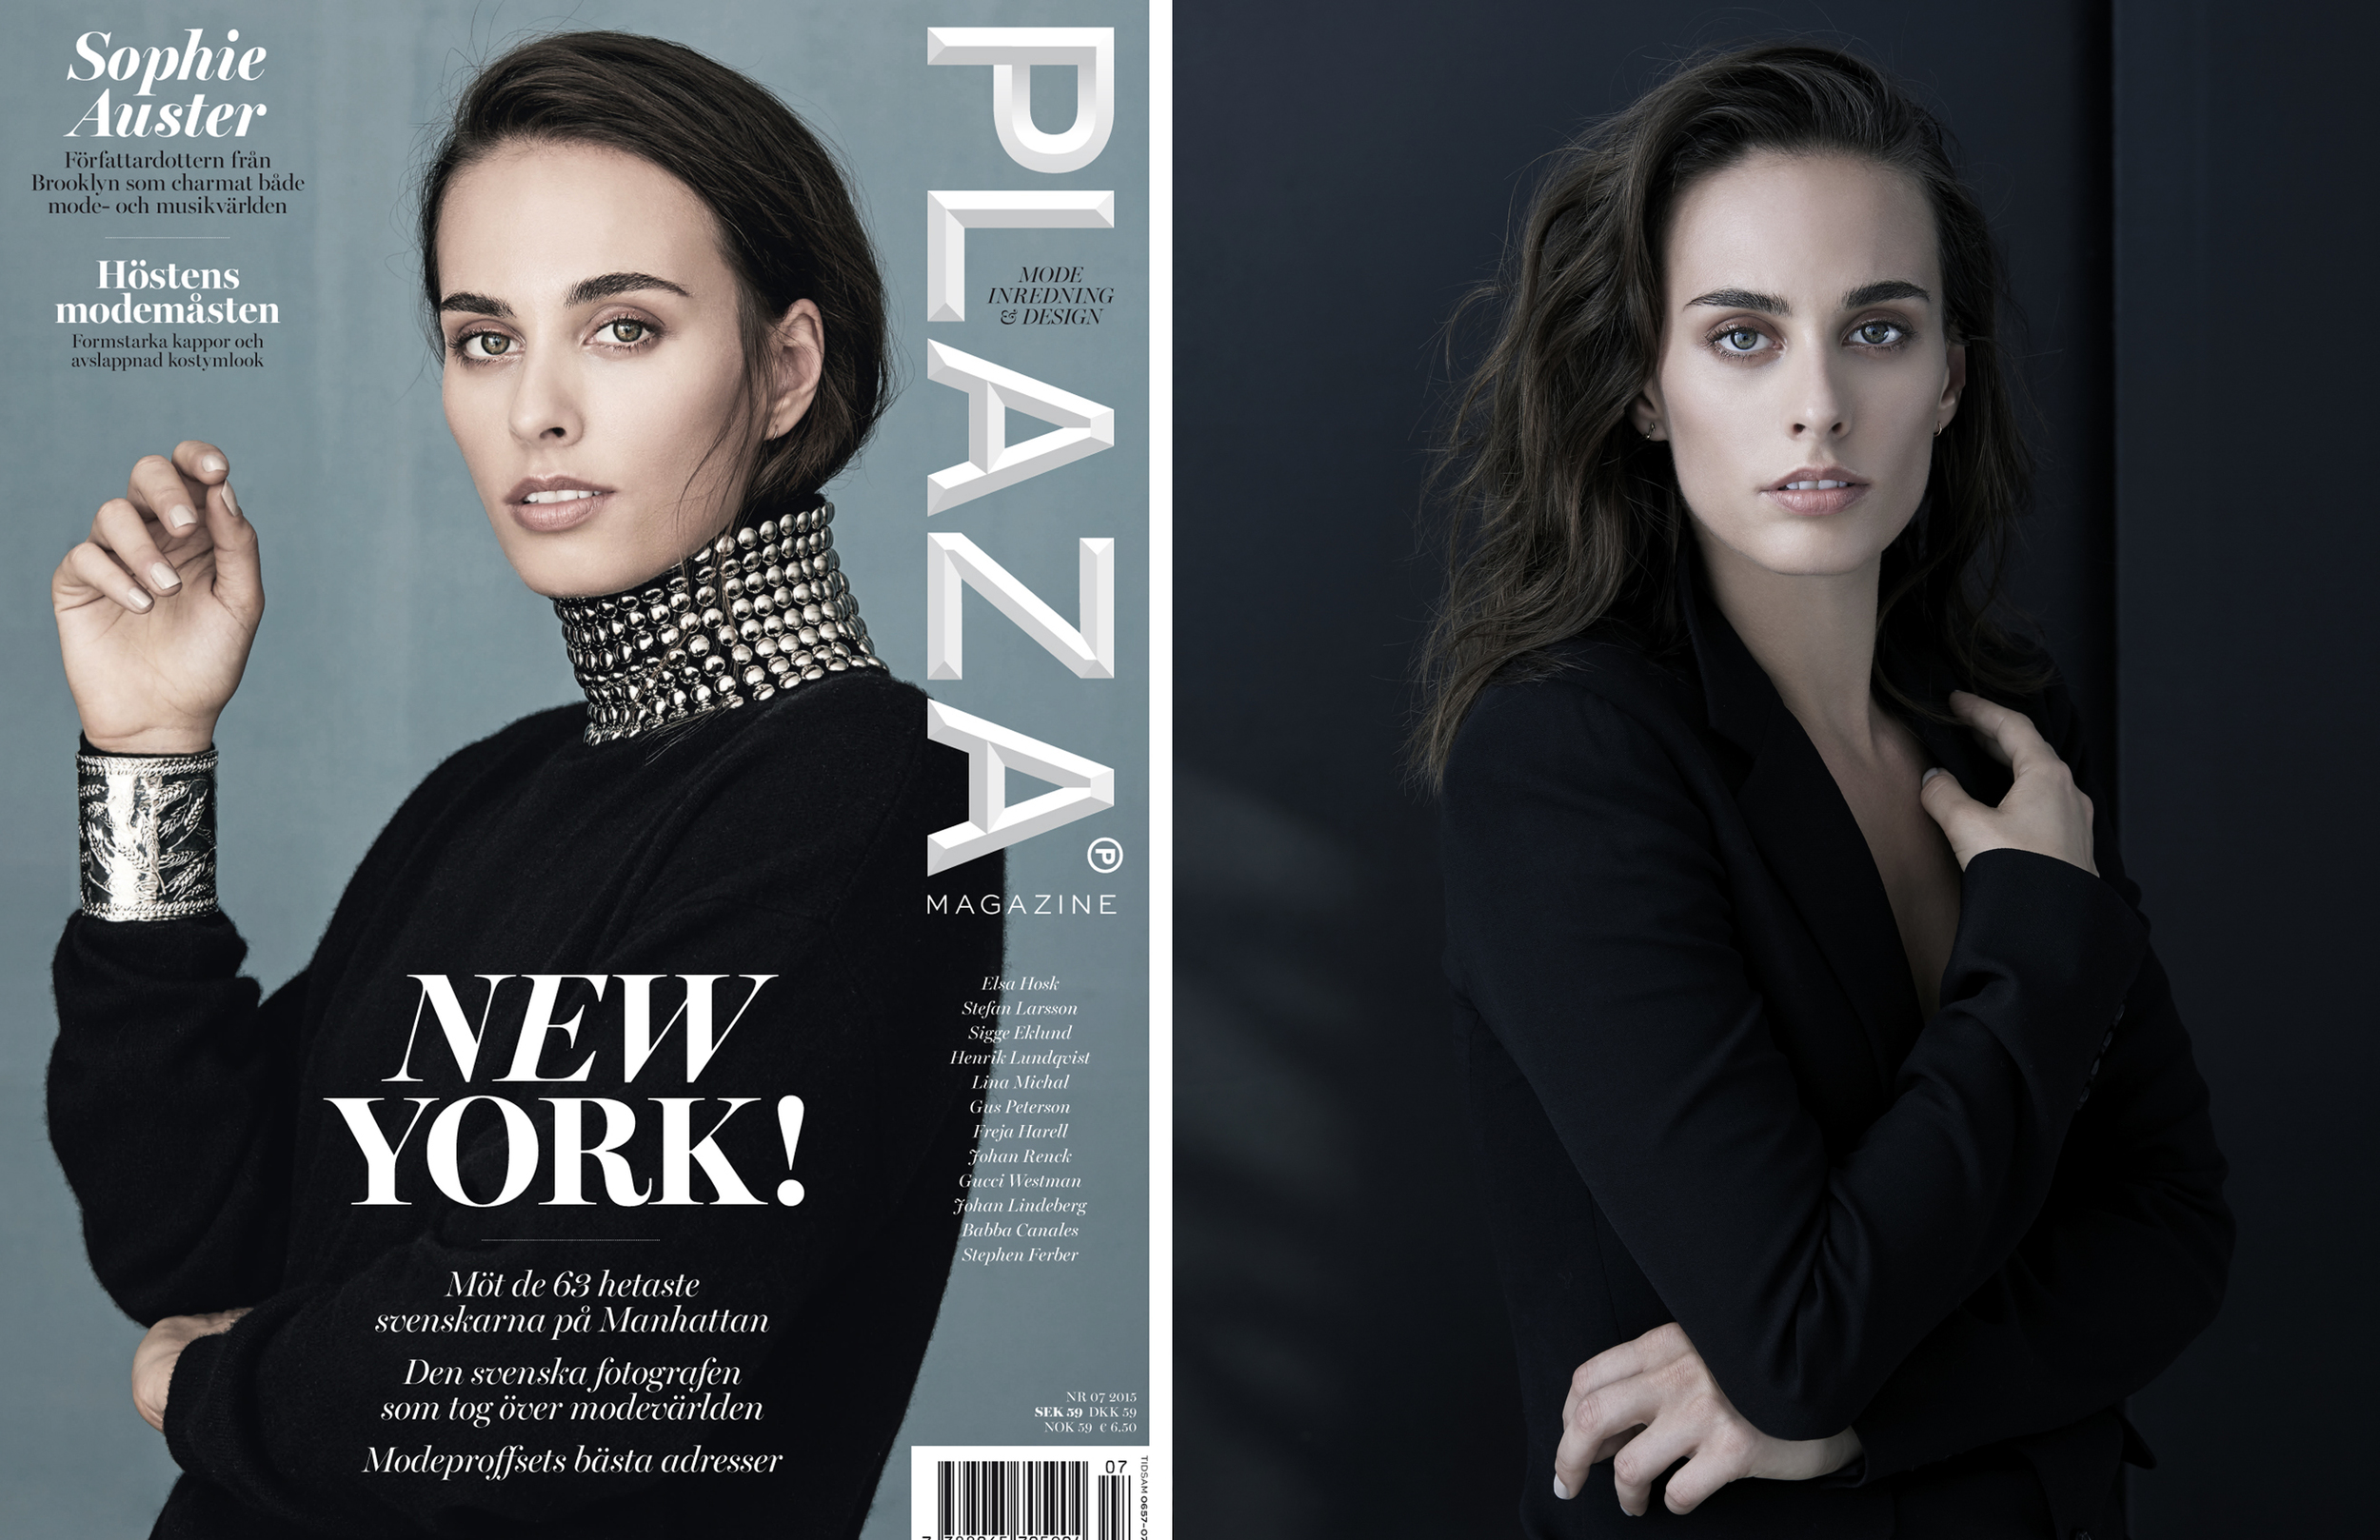 sophie-auster-plaza-magazine-cover-ellinor-stigle